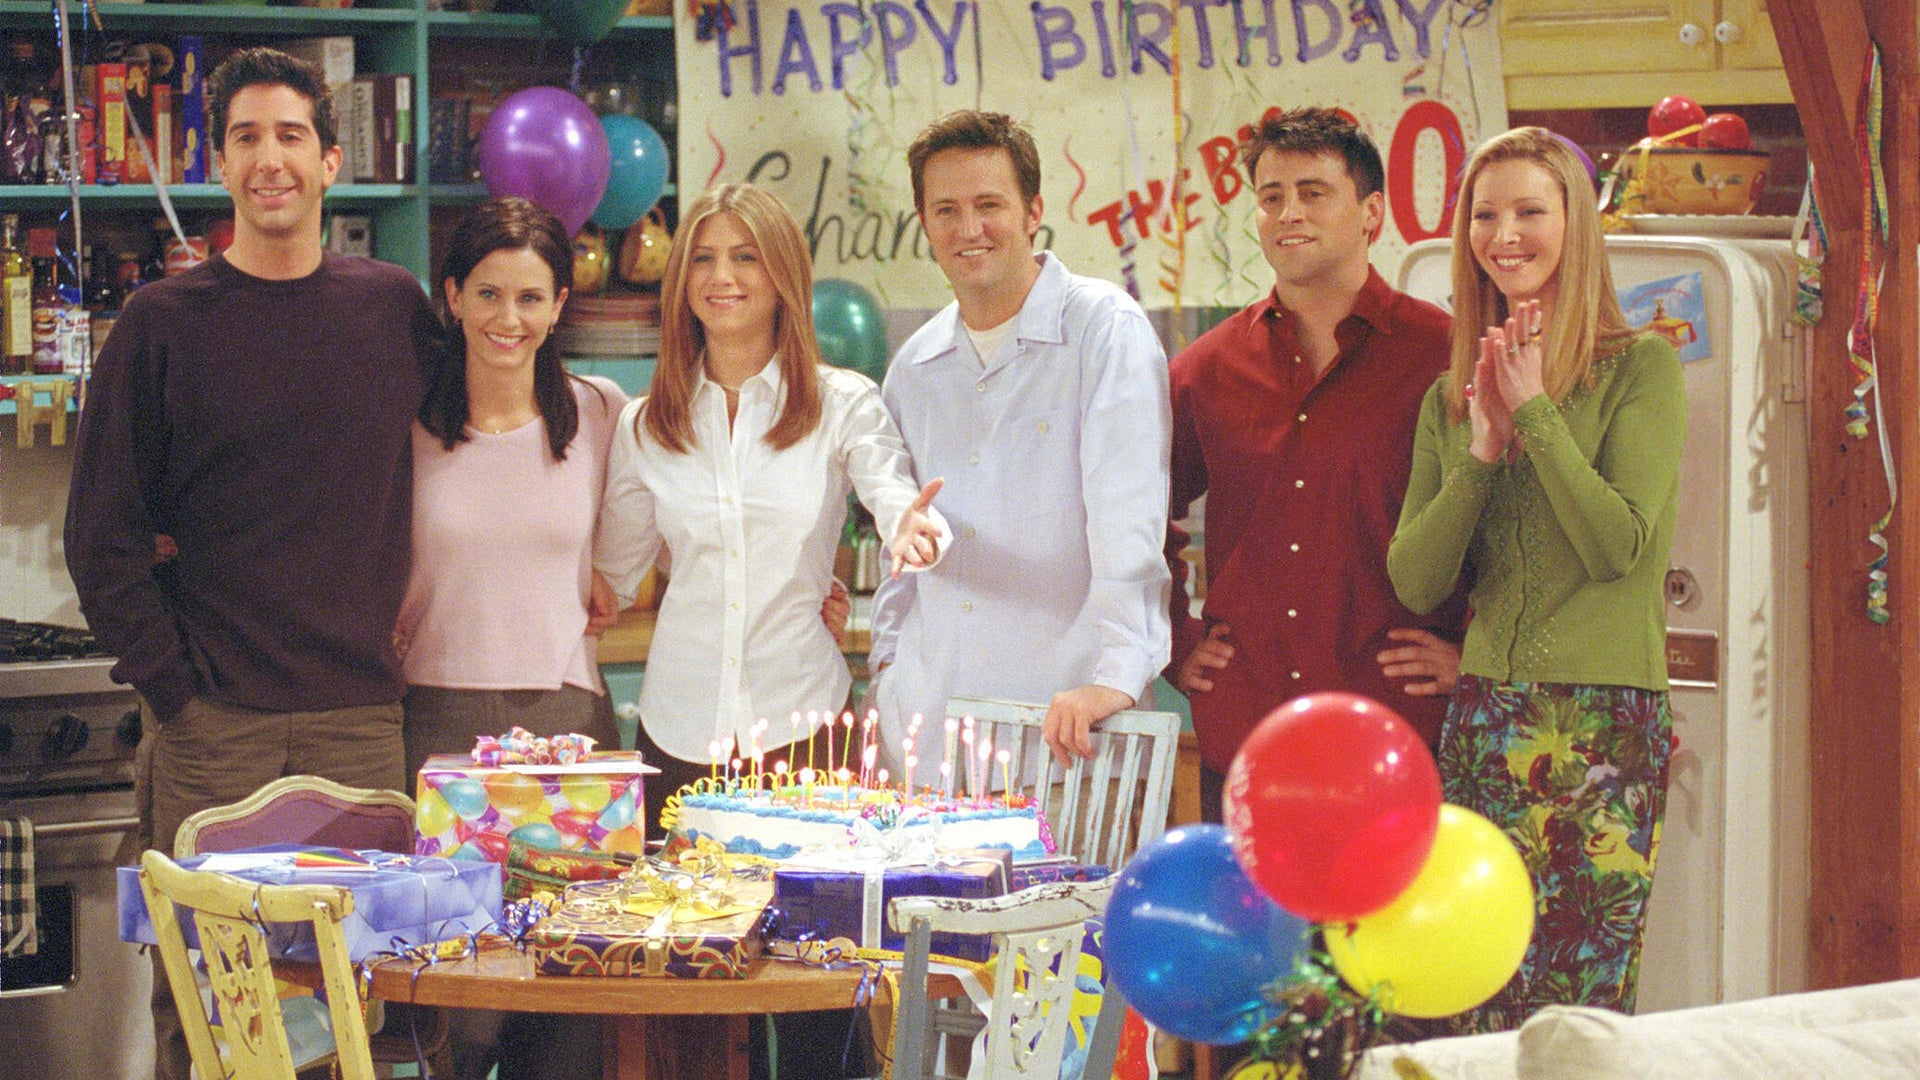 David Schwimmer, Courteney Cox, Jennifer Aniston, Matthew Perry, Matt LeBlanc, and Lisa Kudrow, Friends